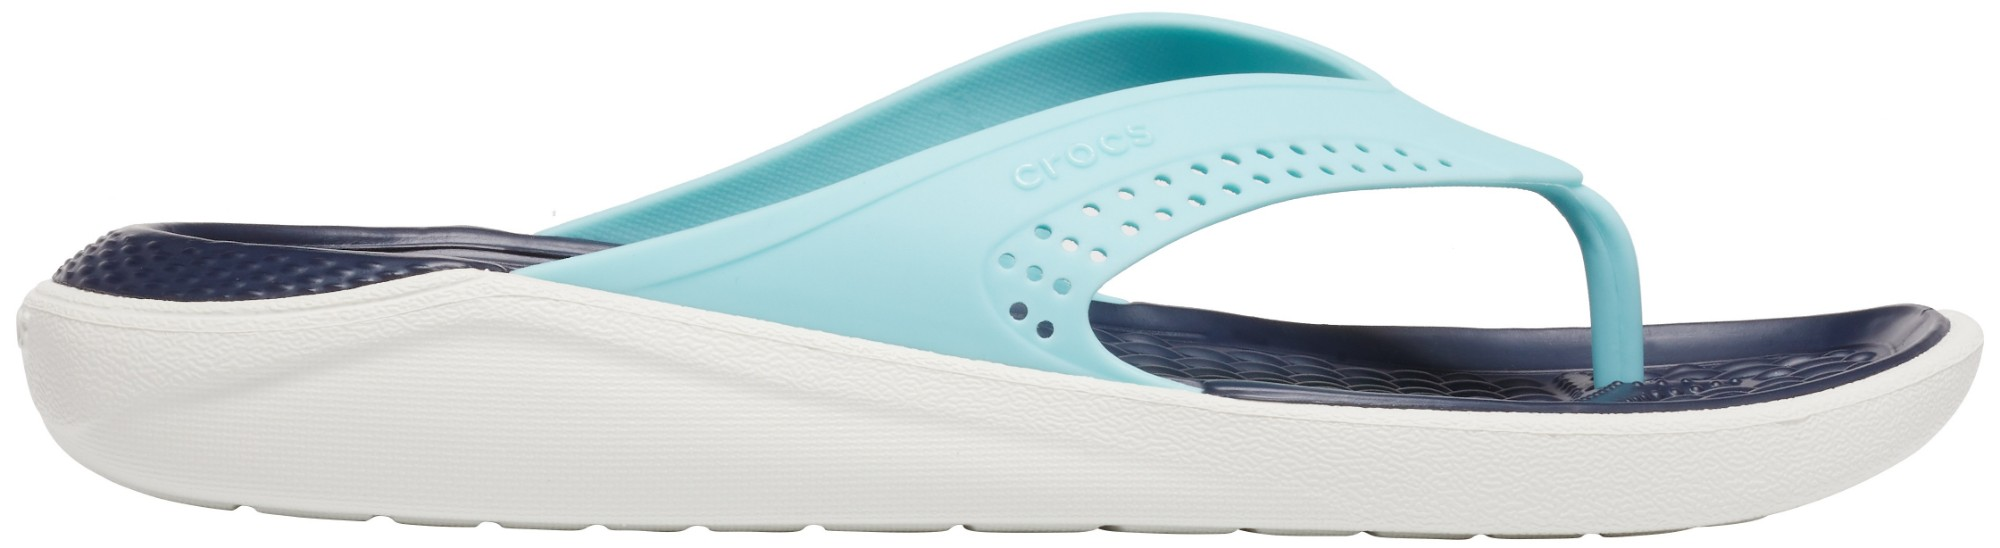 Crocs™ LiteRide Flip Ice Blue/Almost White 39,5